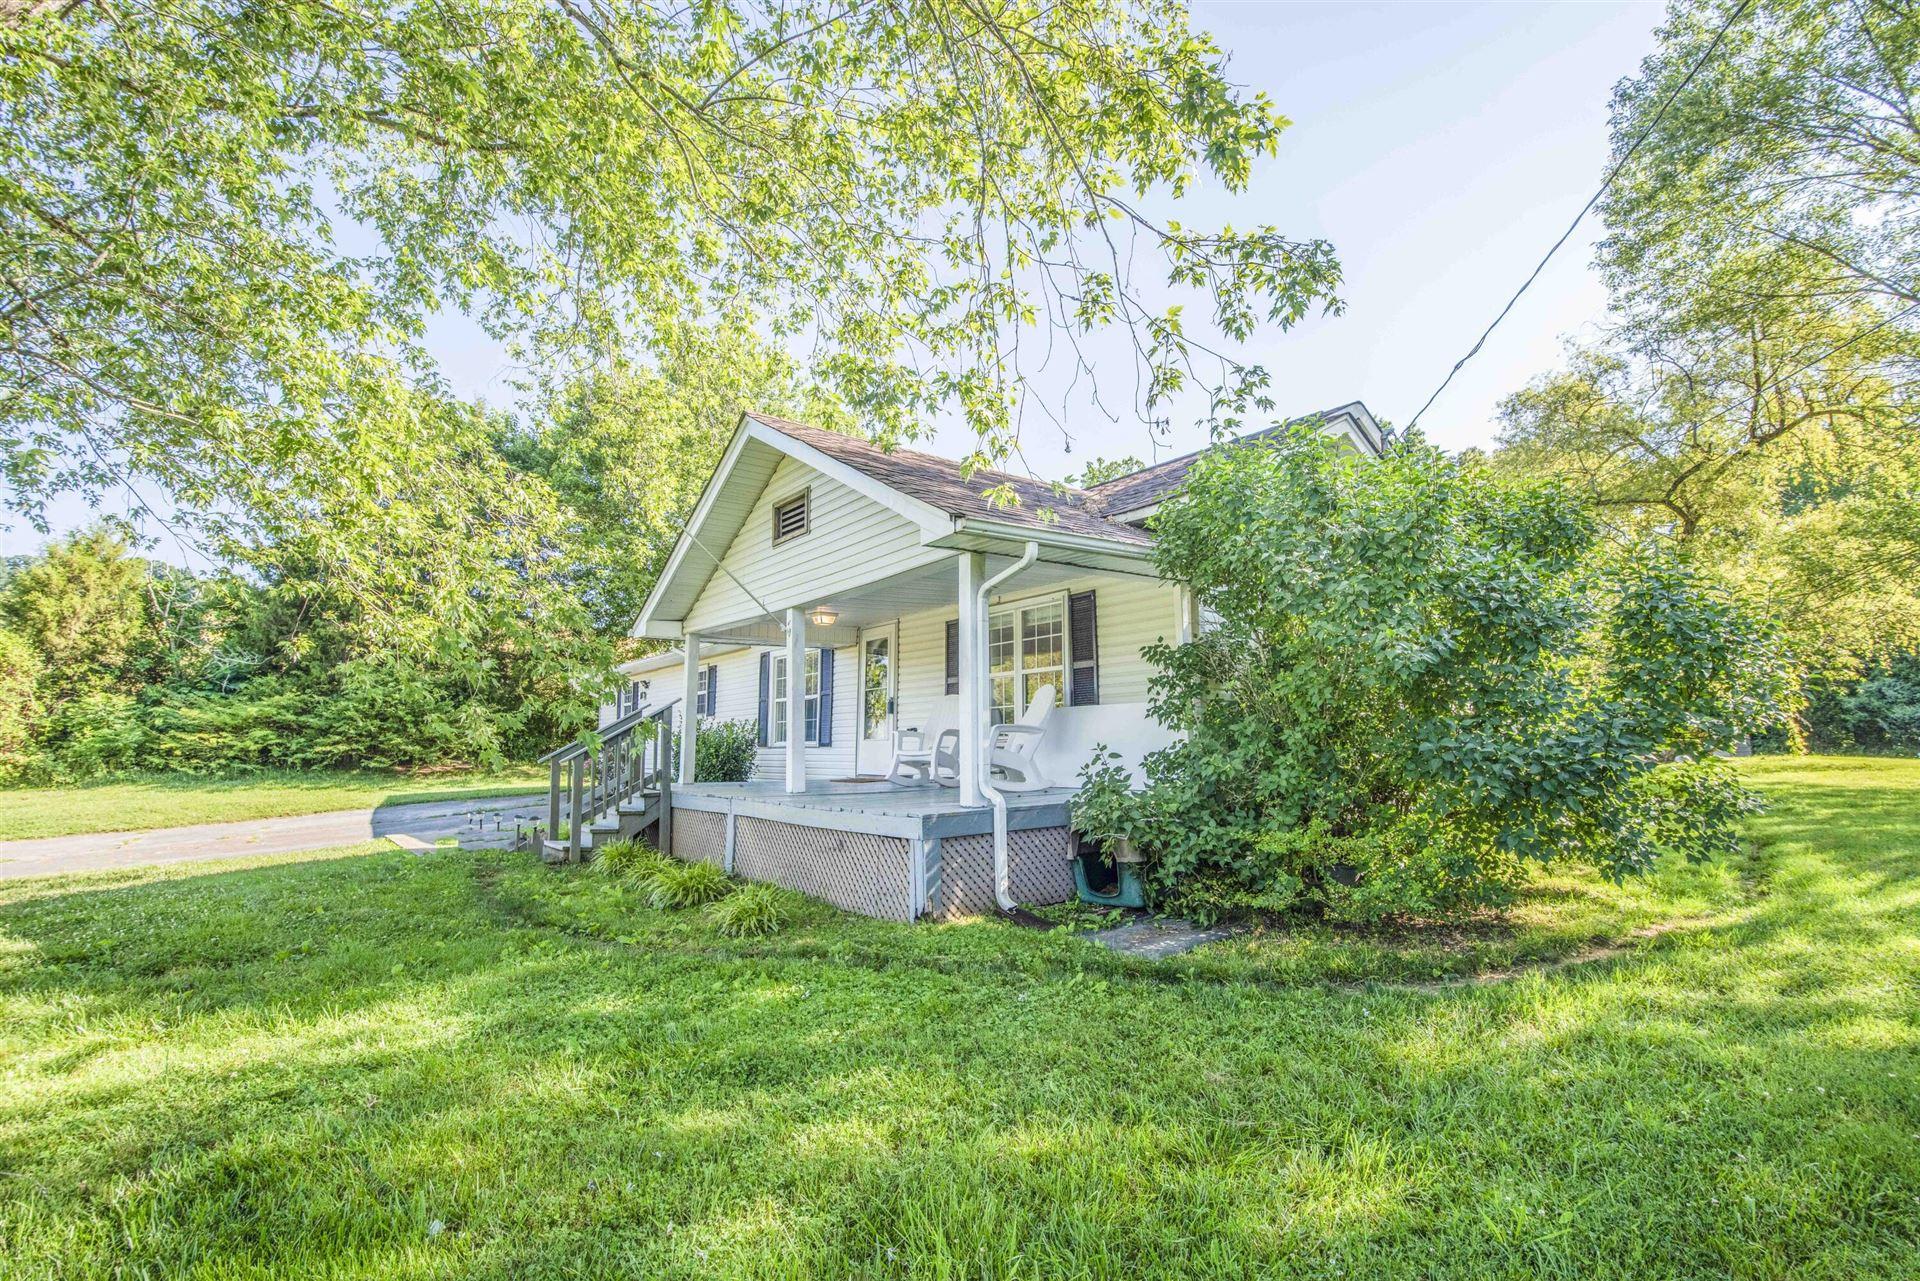 Photo of 168 Oakland Rd, Maynardville, TN 37807 (MLS # 1156612)